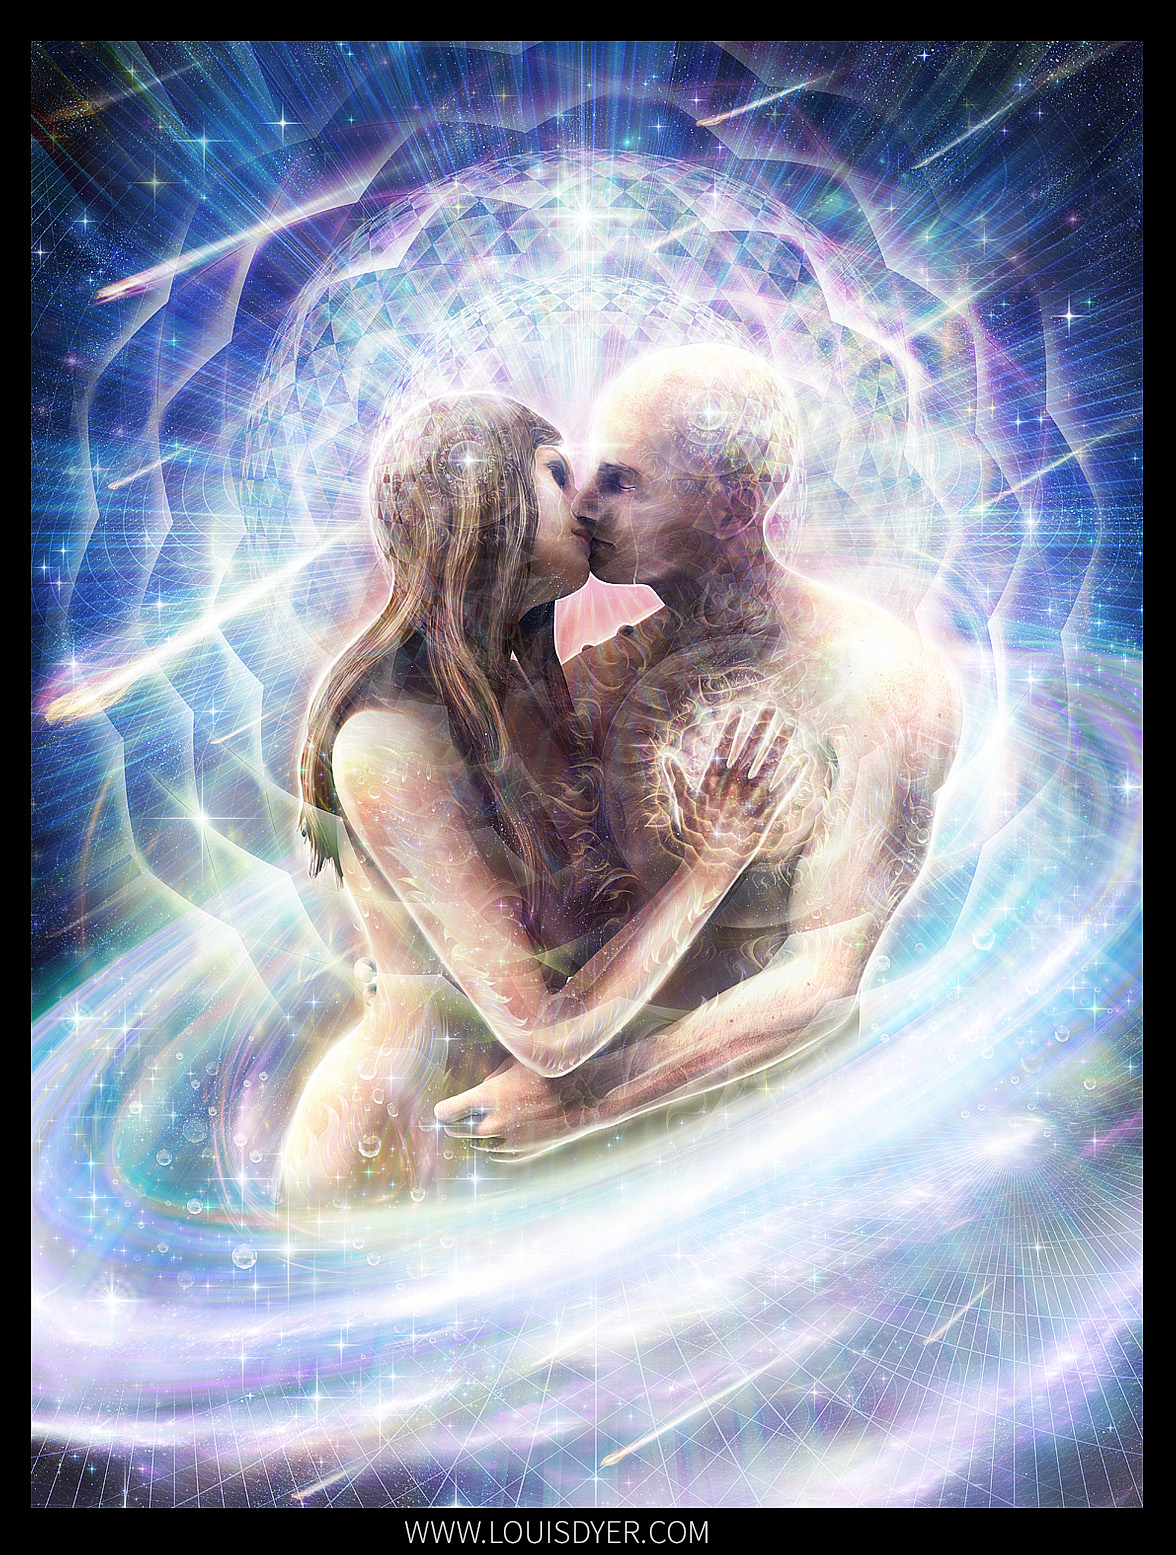 Divine Love Louis Dyer Visionary Digital Artist